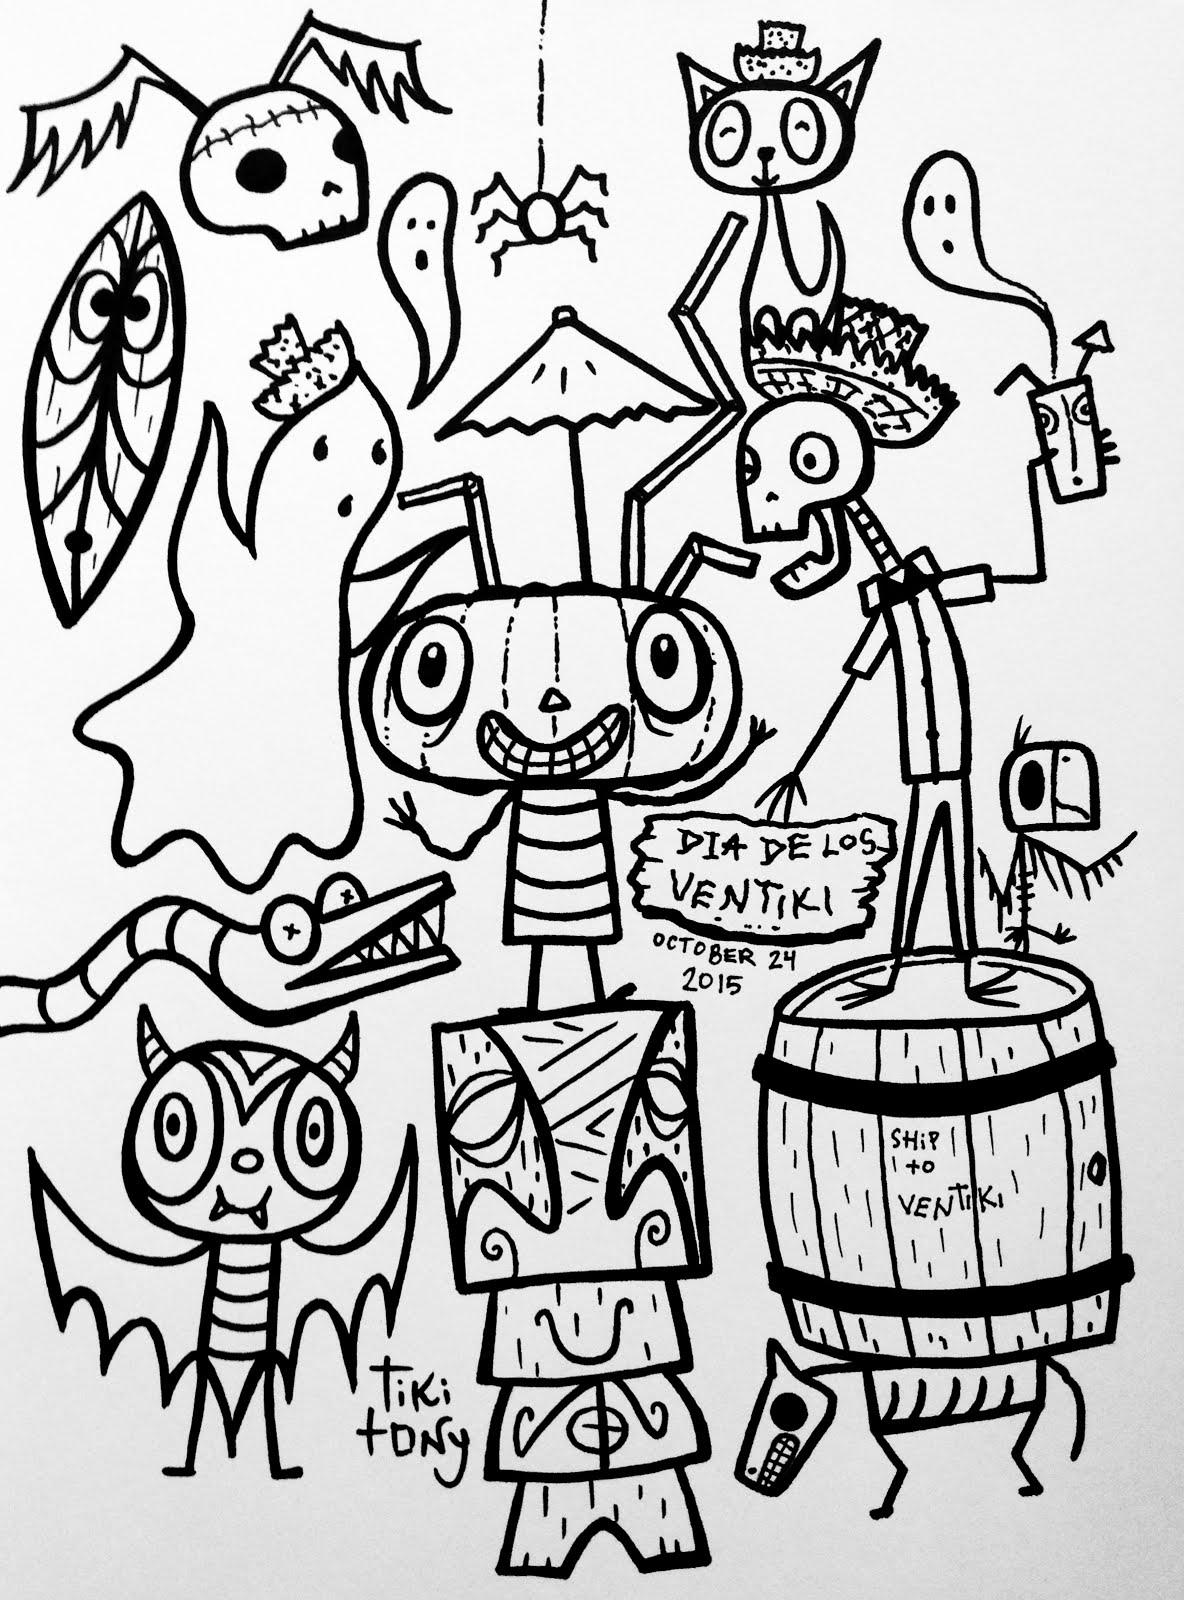 1184x1600 Dia De Los Ventiki Coloring Page Tiki Tony Tiki Tony